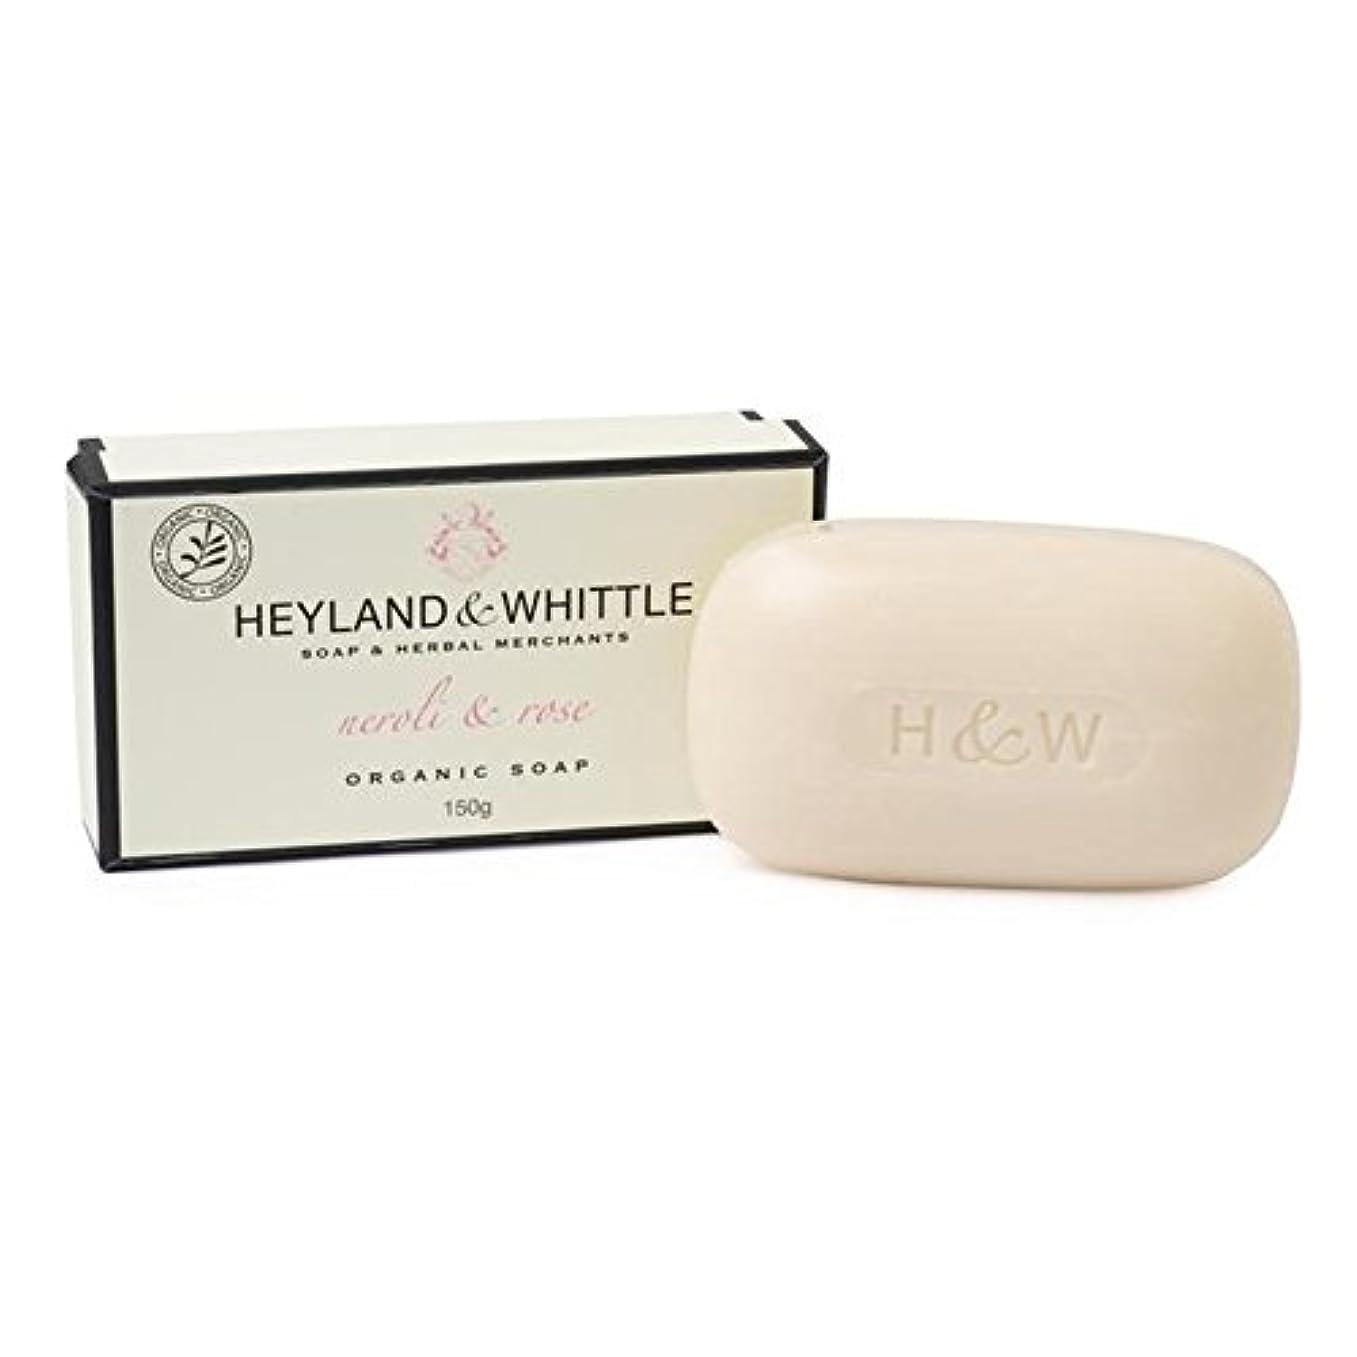 Heyland & Whittle Organic Neroli & Rose Soap Bar 150g (Pack of 6) - &削る有機ネロリ&ソープバー150グラムをバラ x6 [並行輸入品]